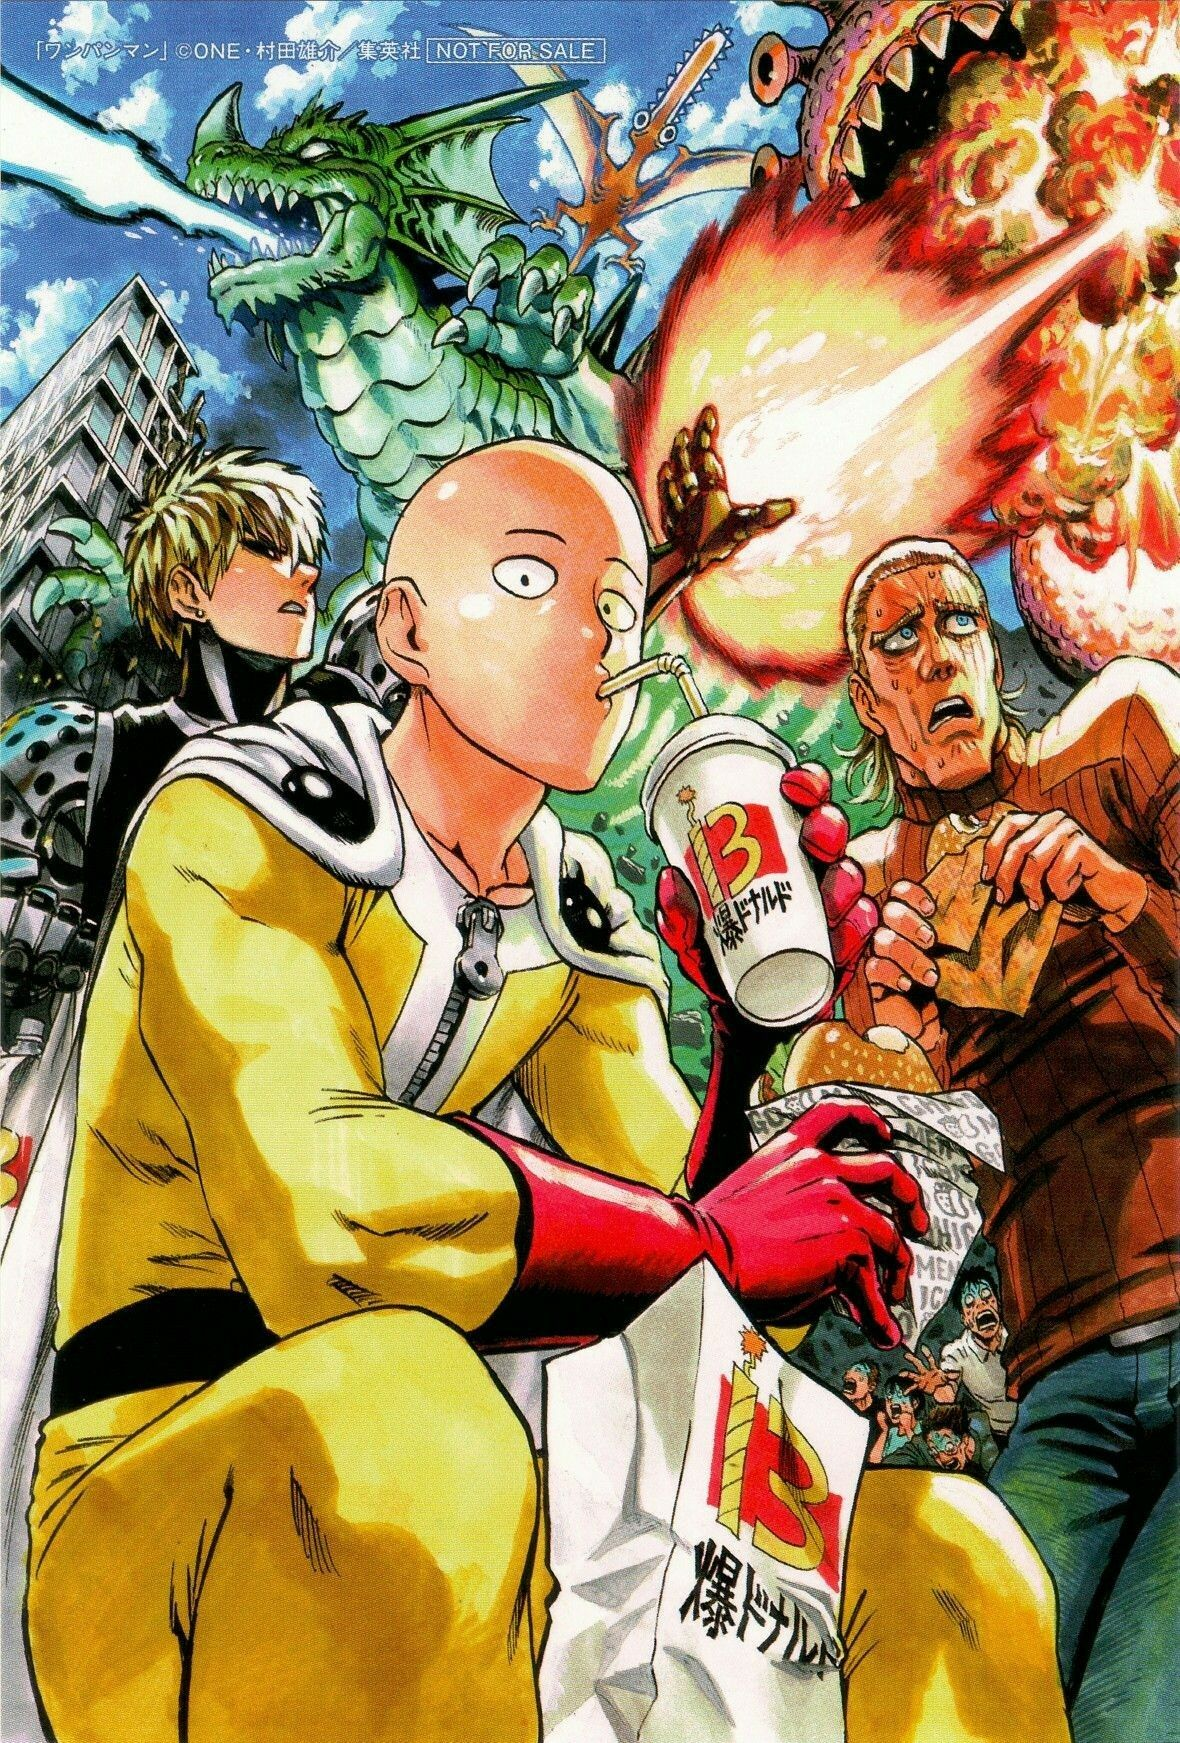 One punch man #onepunchman #fubuki  #saitama #tatsumaki #genosai